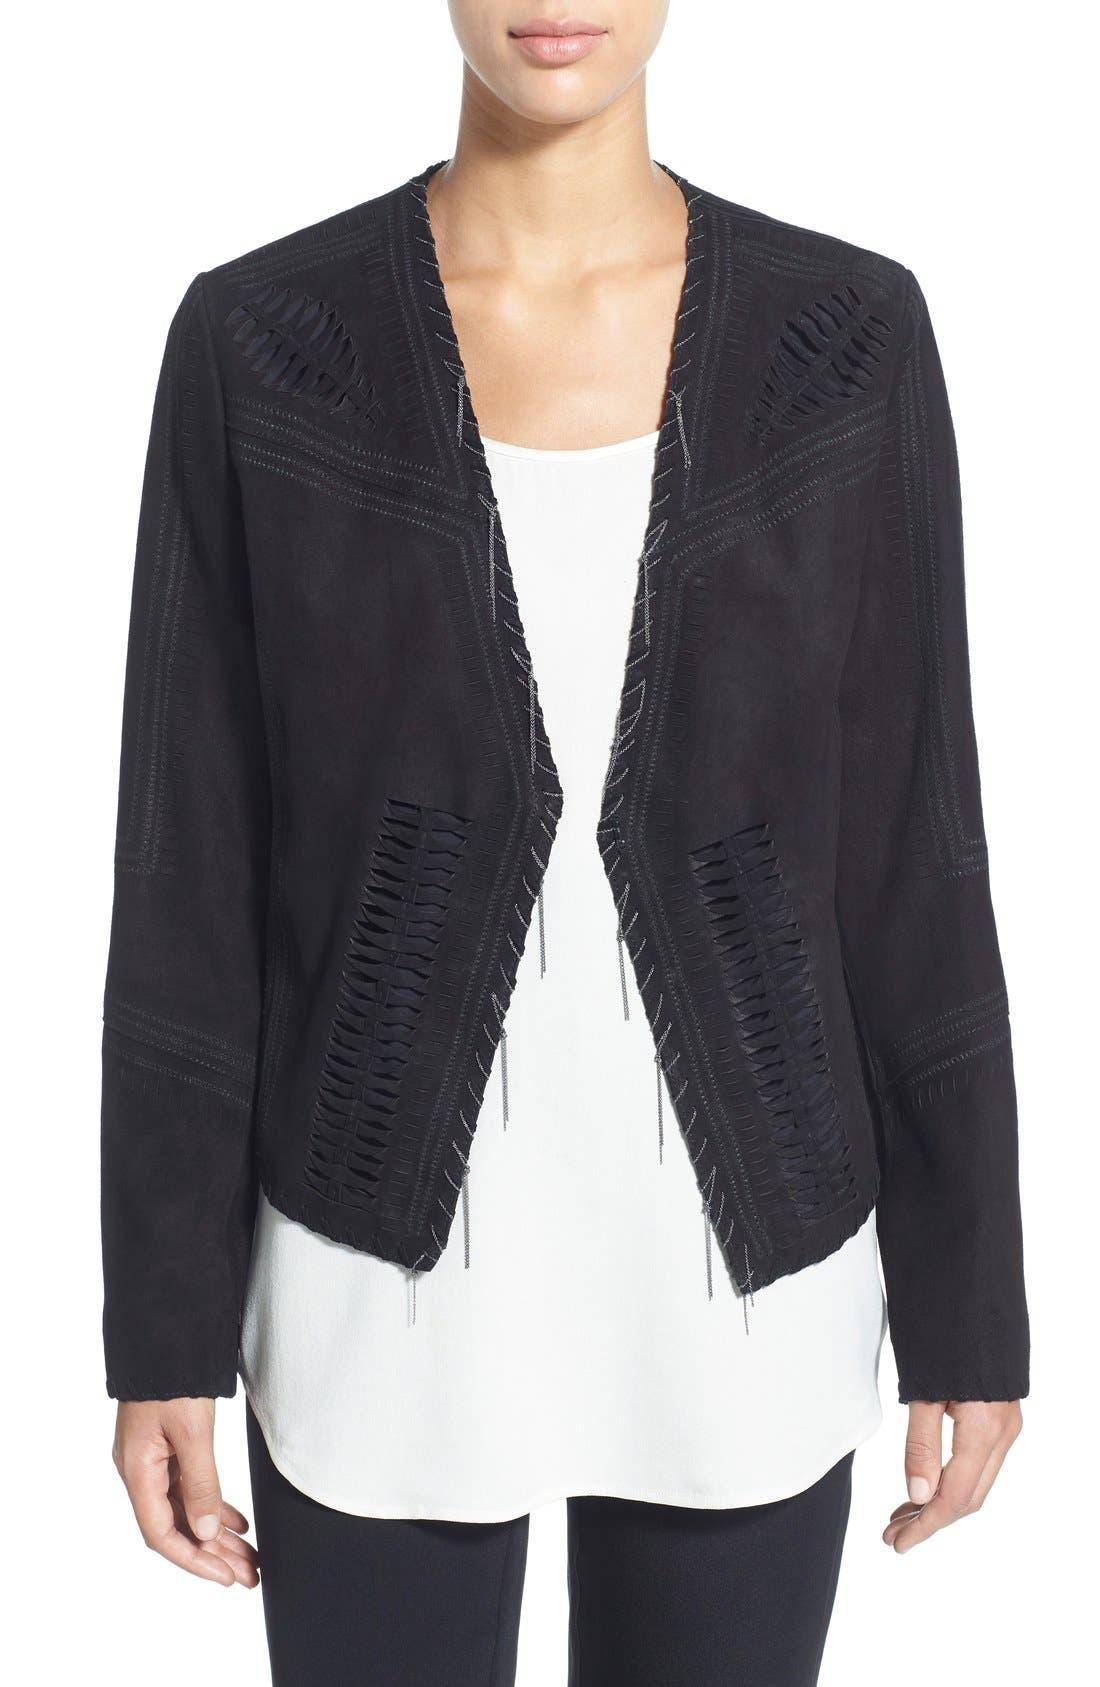 'Rhea' Chain Detail Suede Jacket,                         Main,                         color, 001